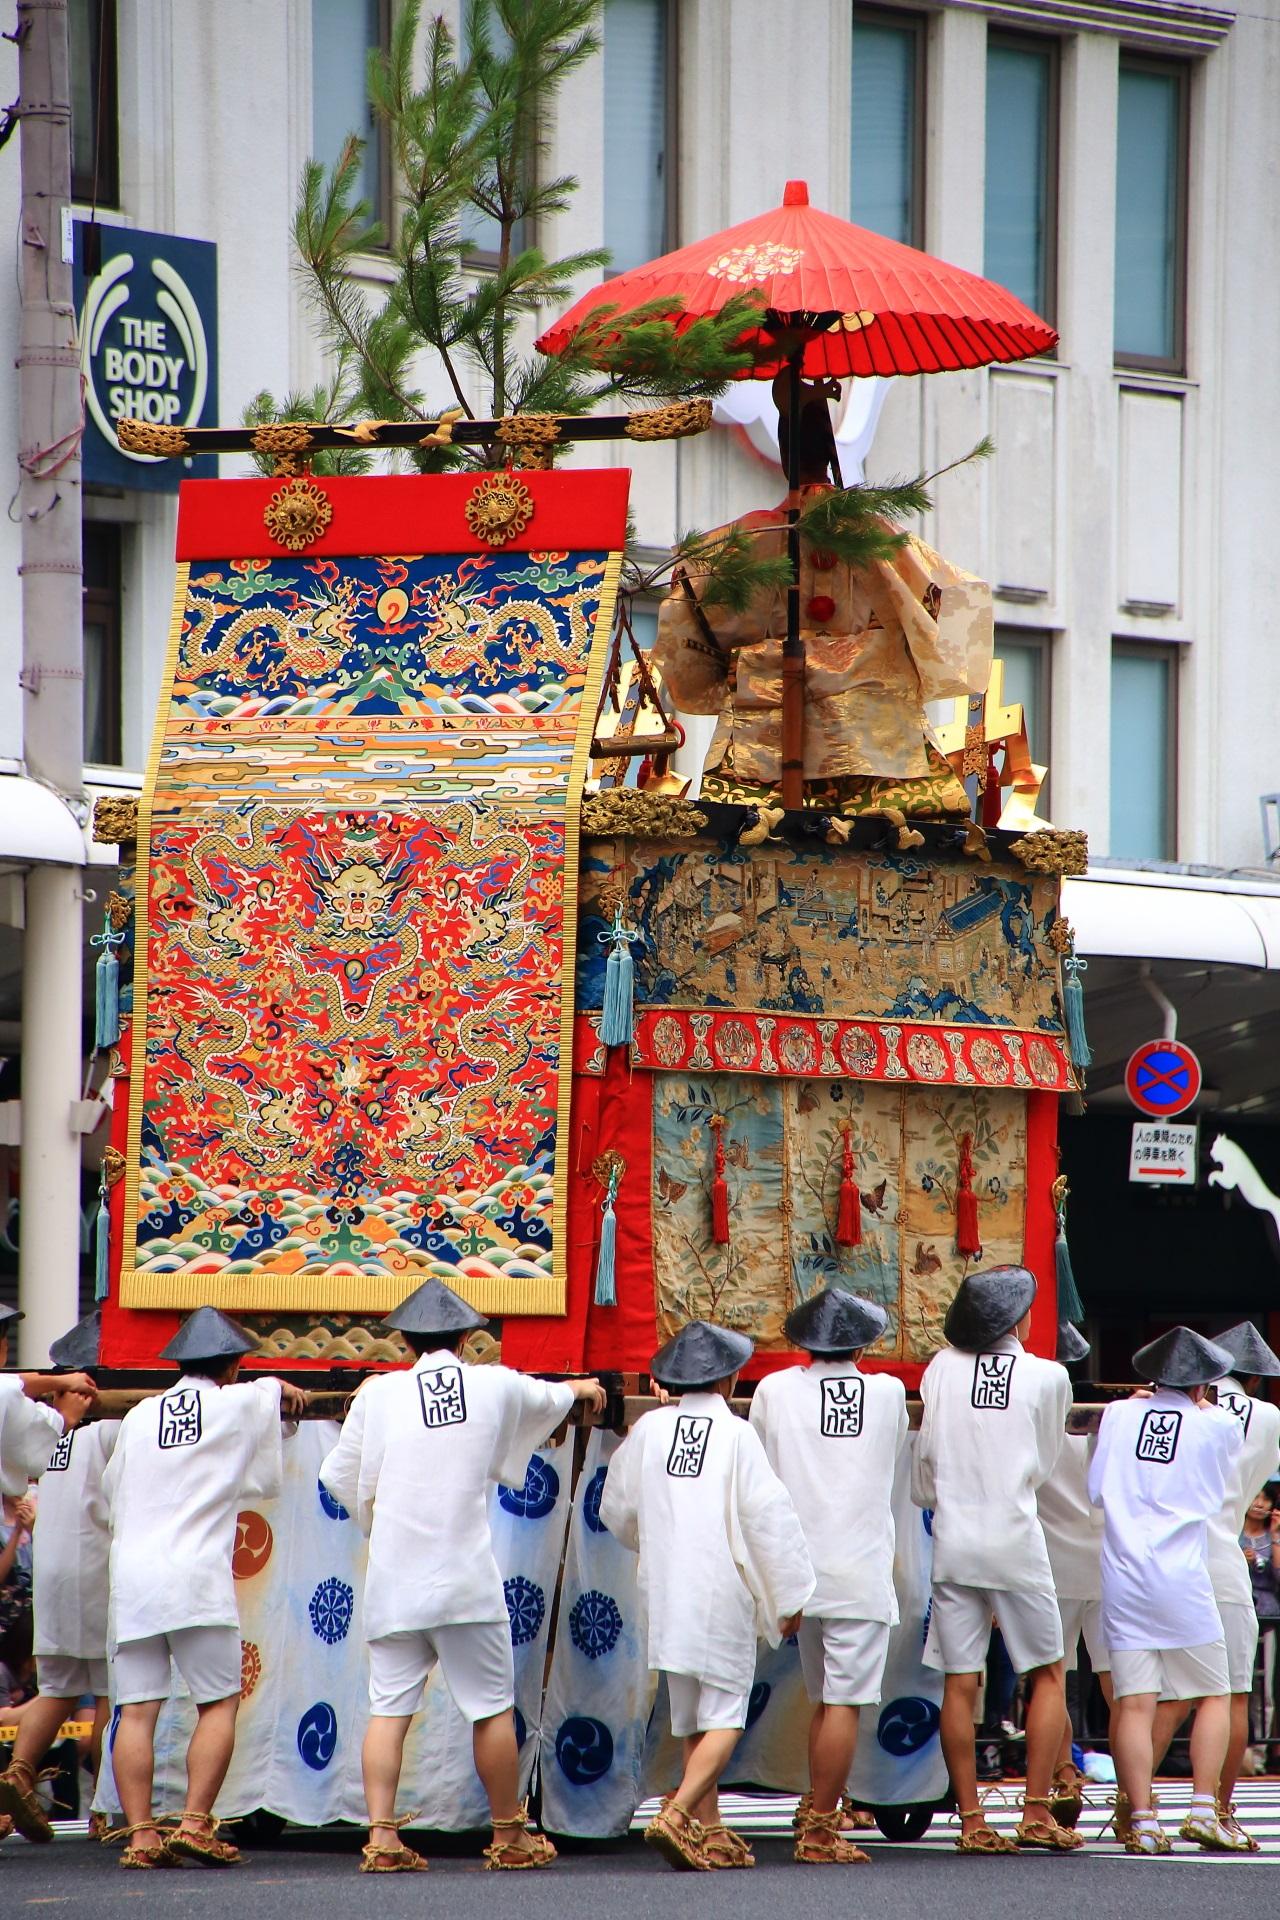 Yamahoko-Jyunko to be held at the Gion-Matsuri Festival